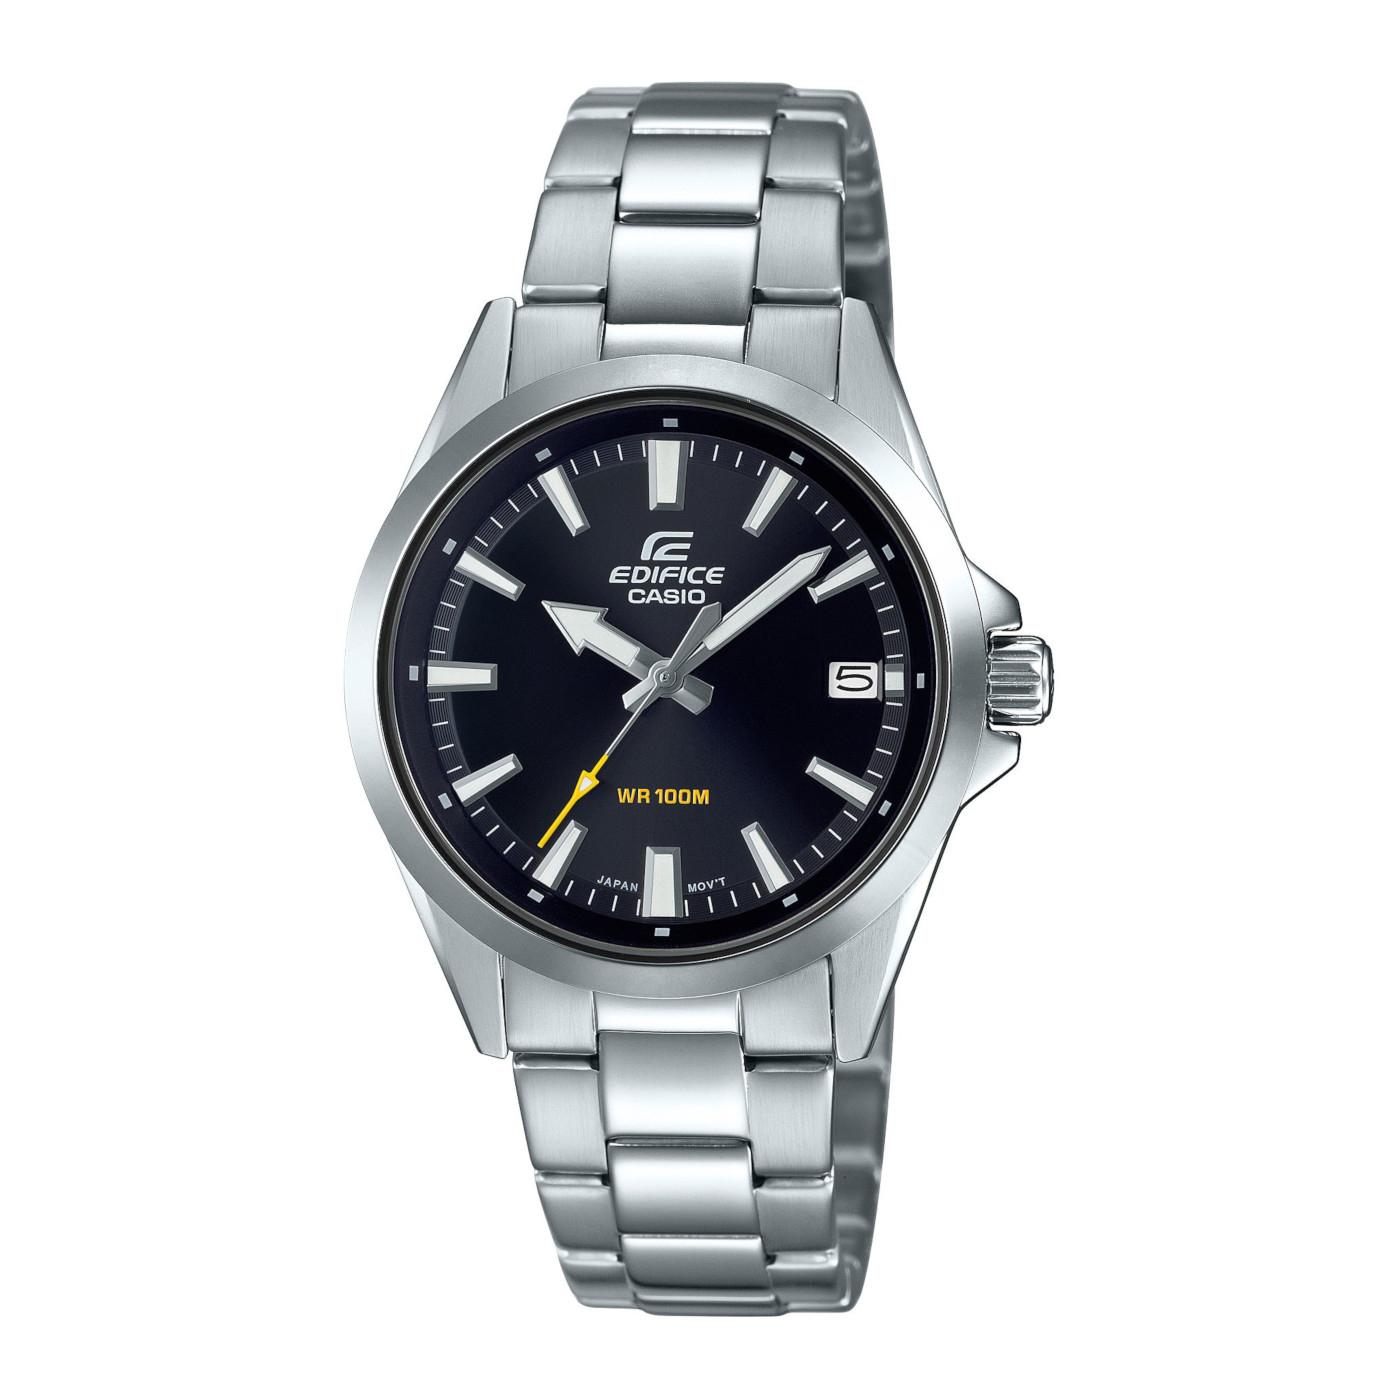 Afbeelding van Edifice Classic horloge EFV 110D 1AVUEF